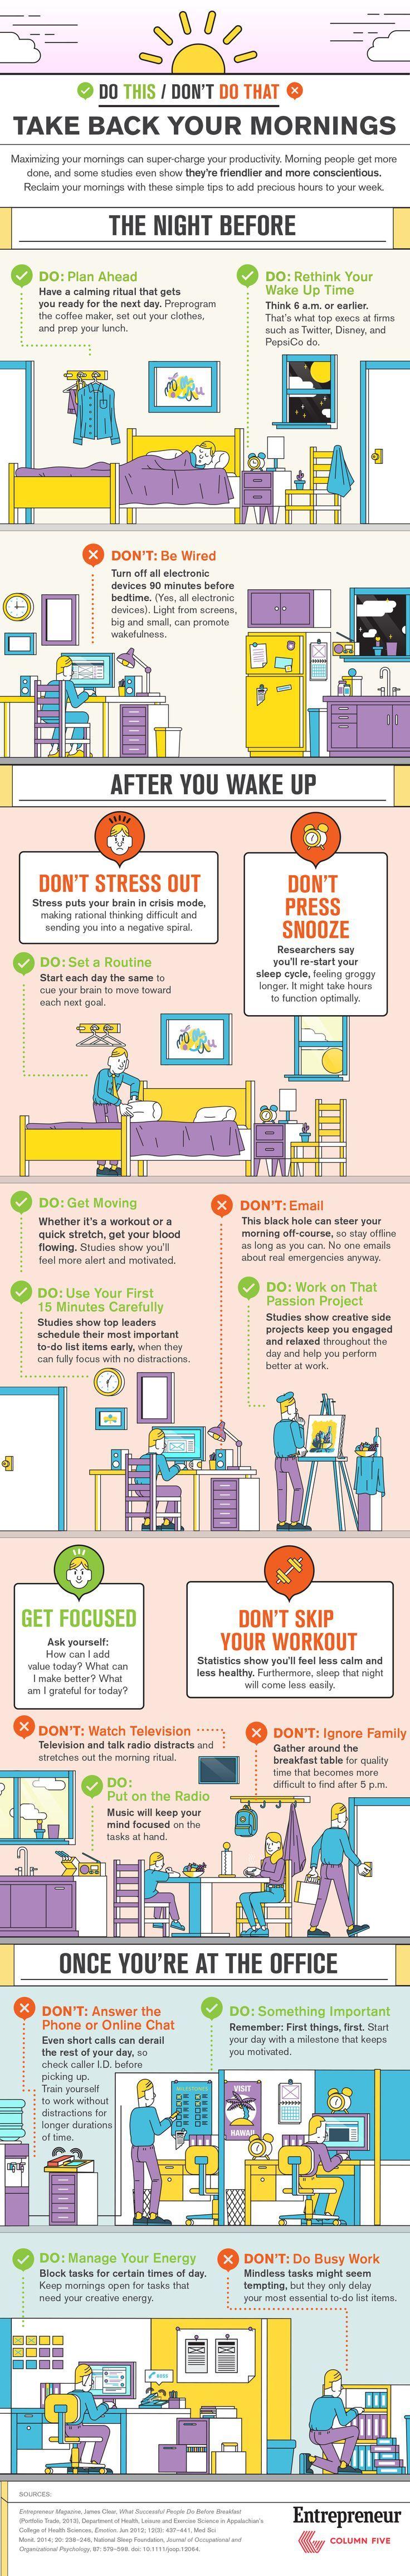 Balance Work: Take Back Your Mornings! (Infographic):